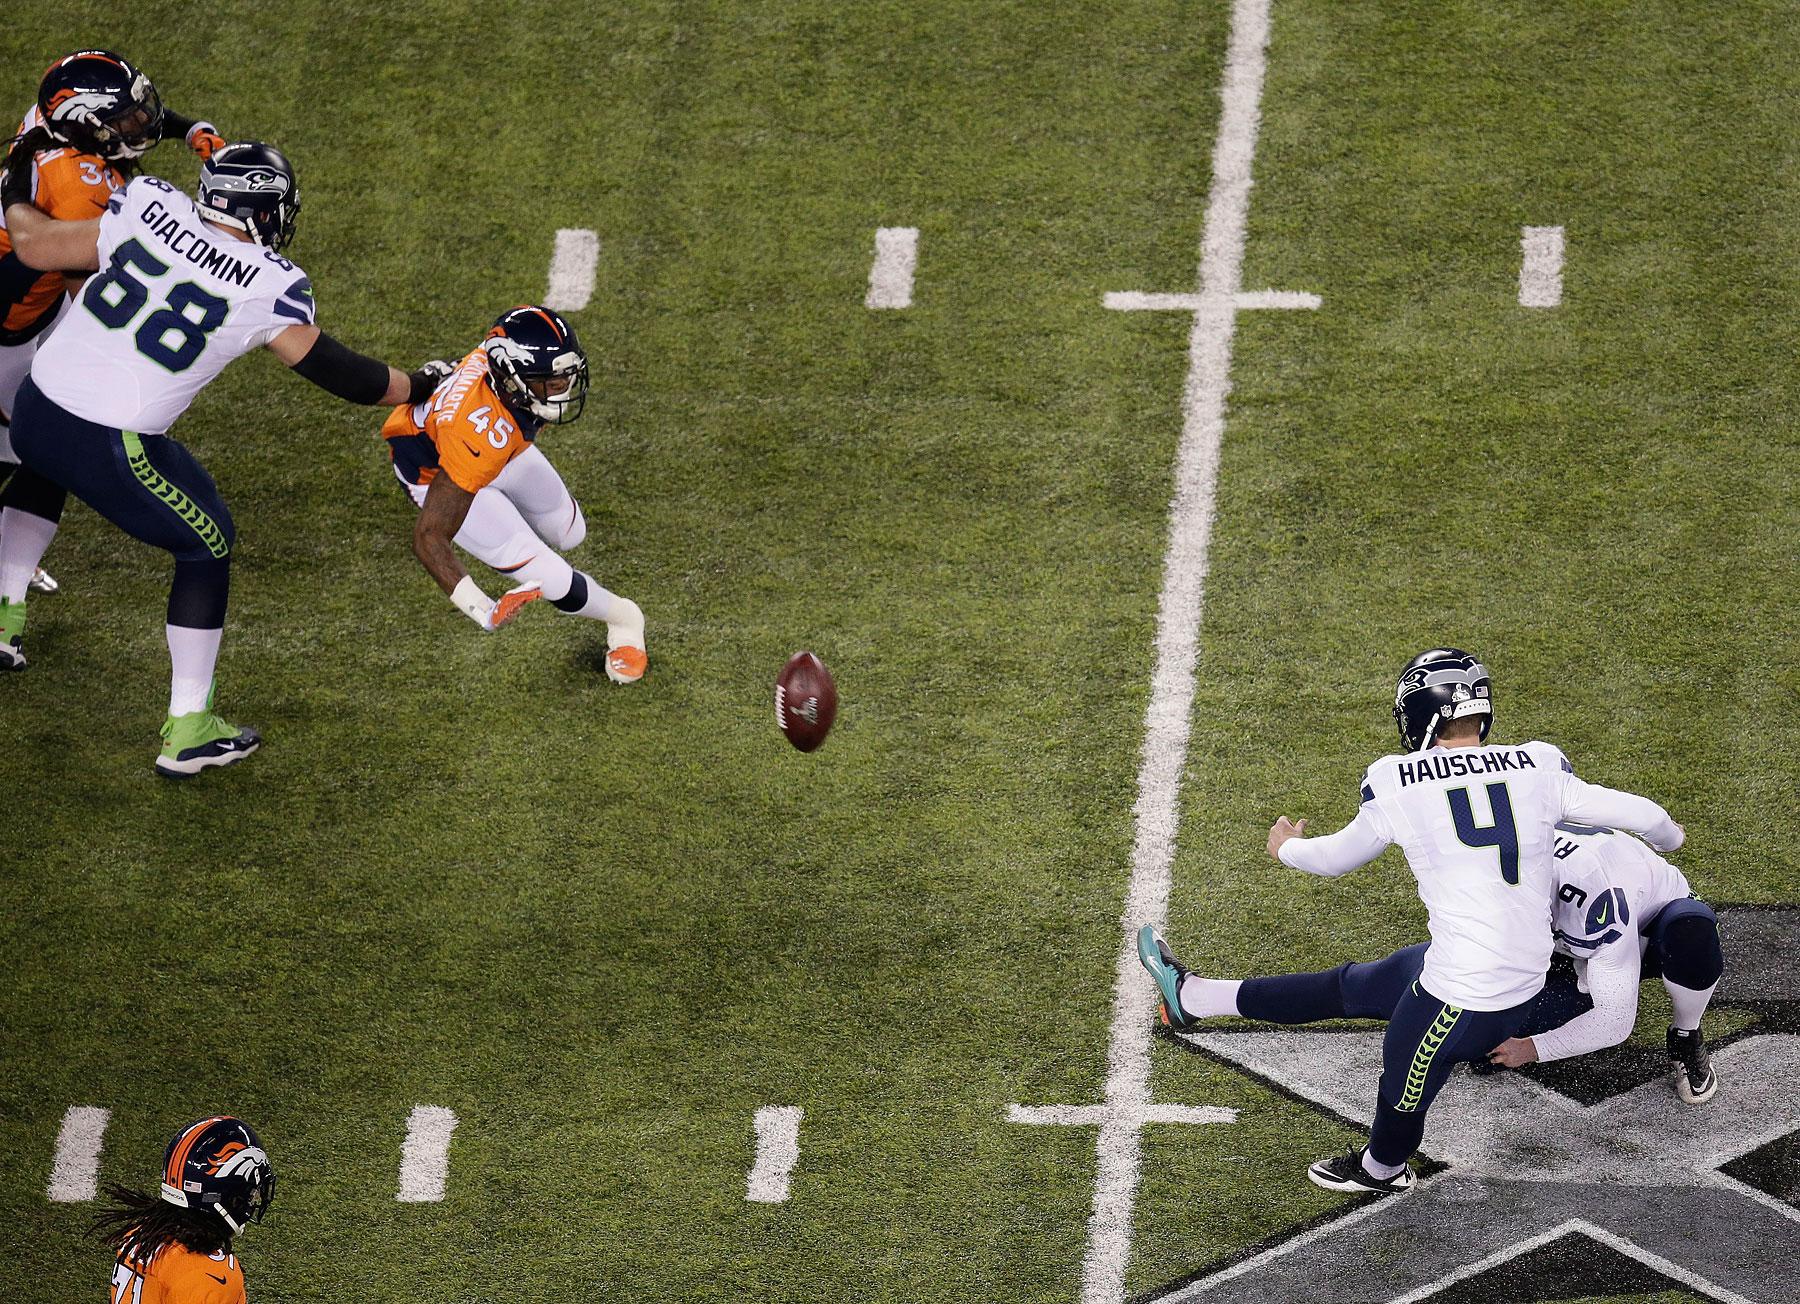 Kicker Steven Hauschka of the Seattle Seahawks kicks a 31 yard field goal during first quarter.